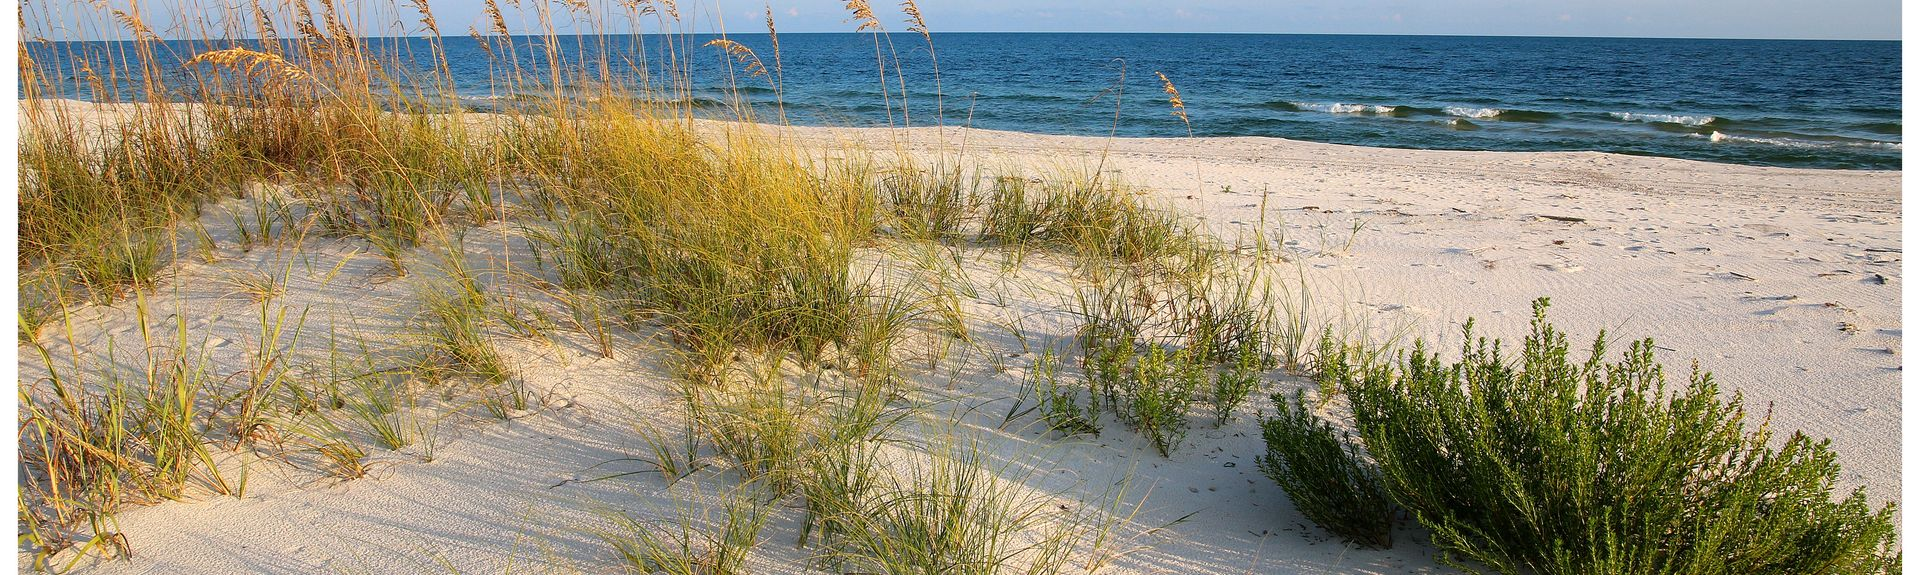 Village of Tannin (Orange Beach, Alabama, Stati Uniti d'America)